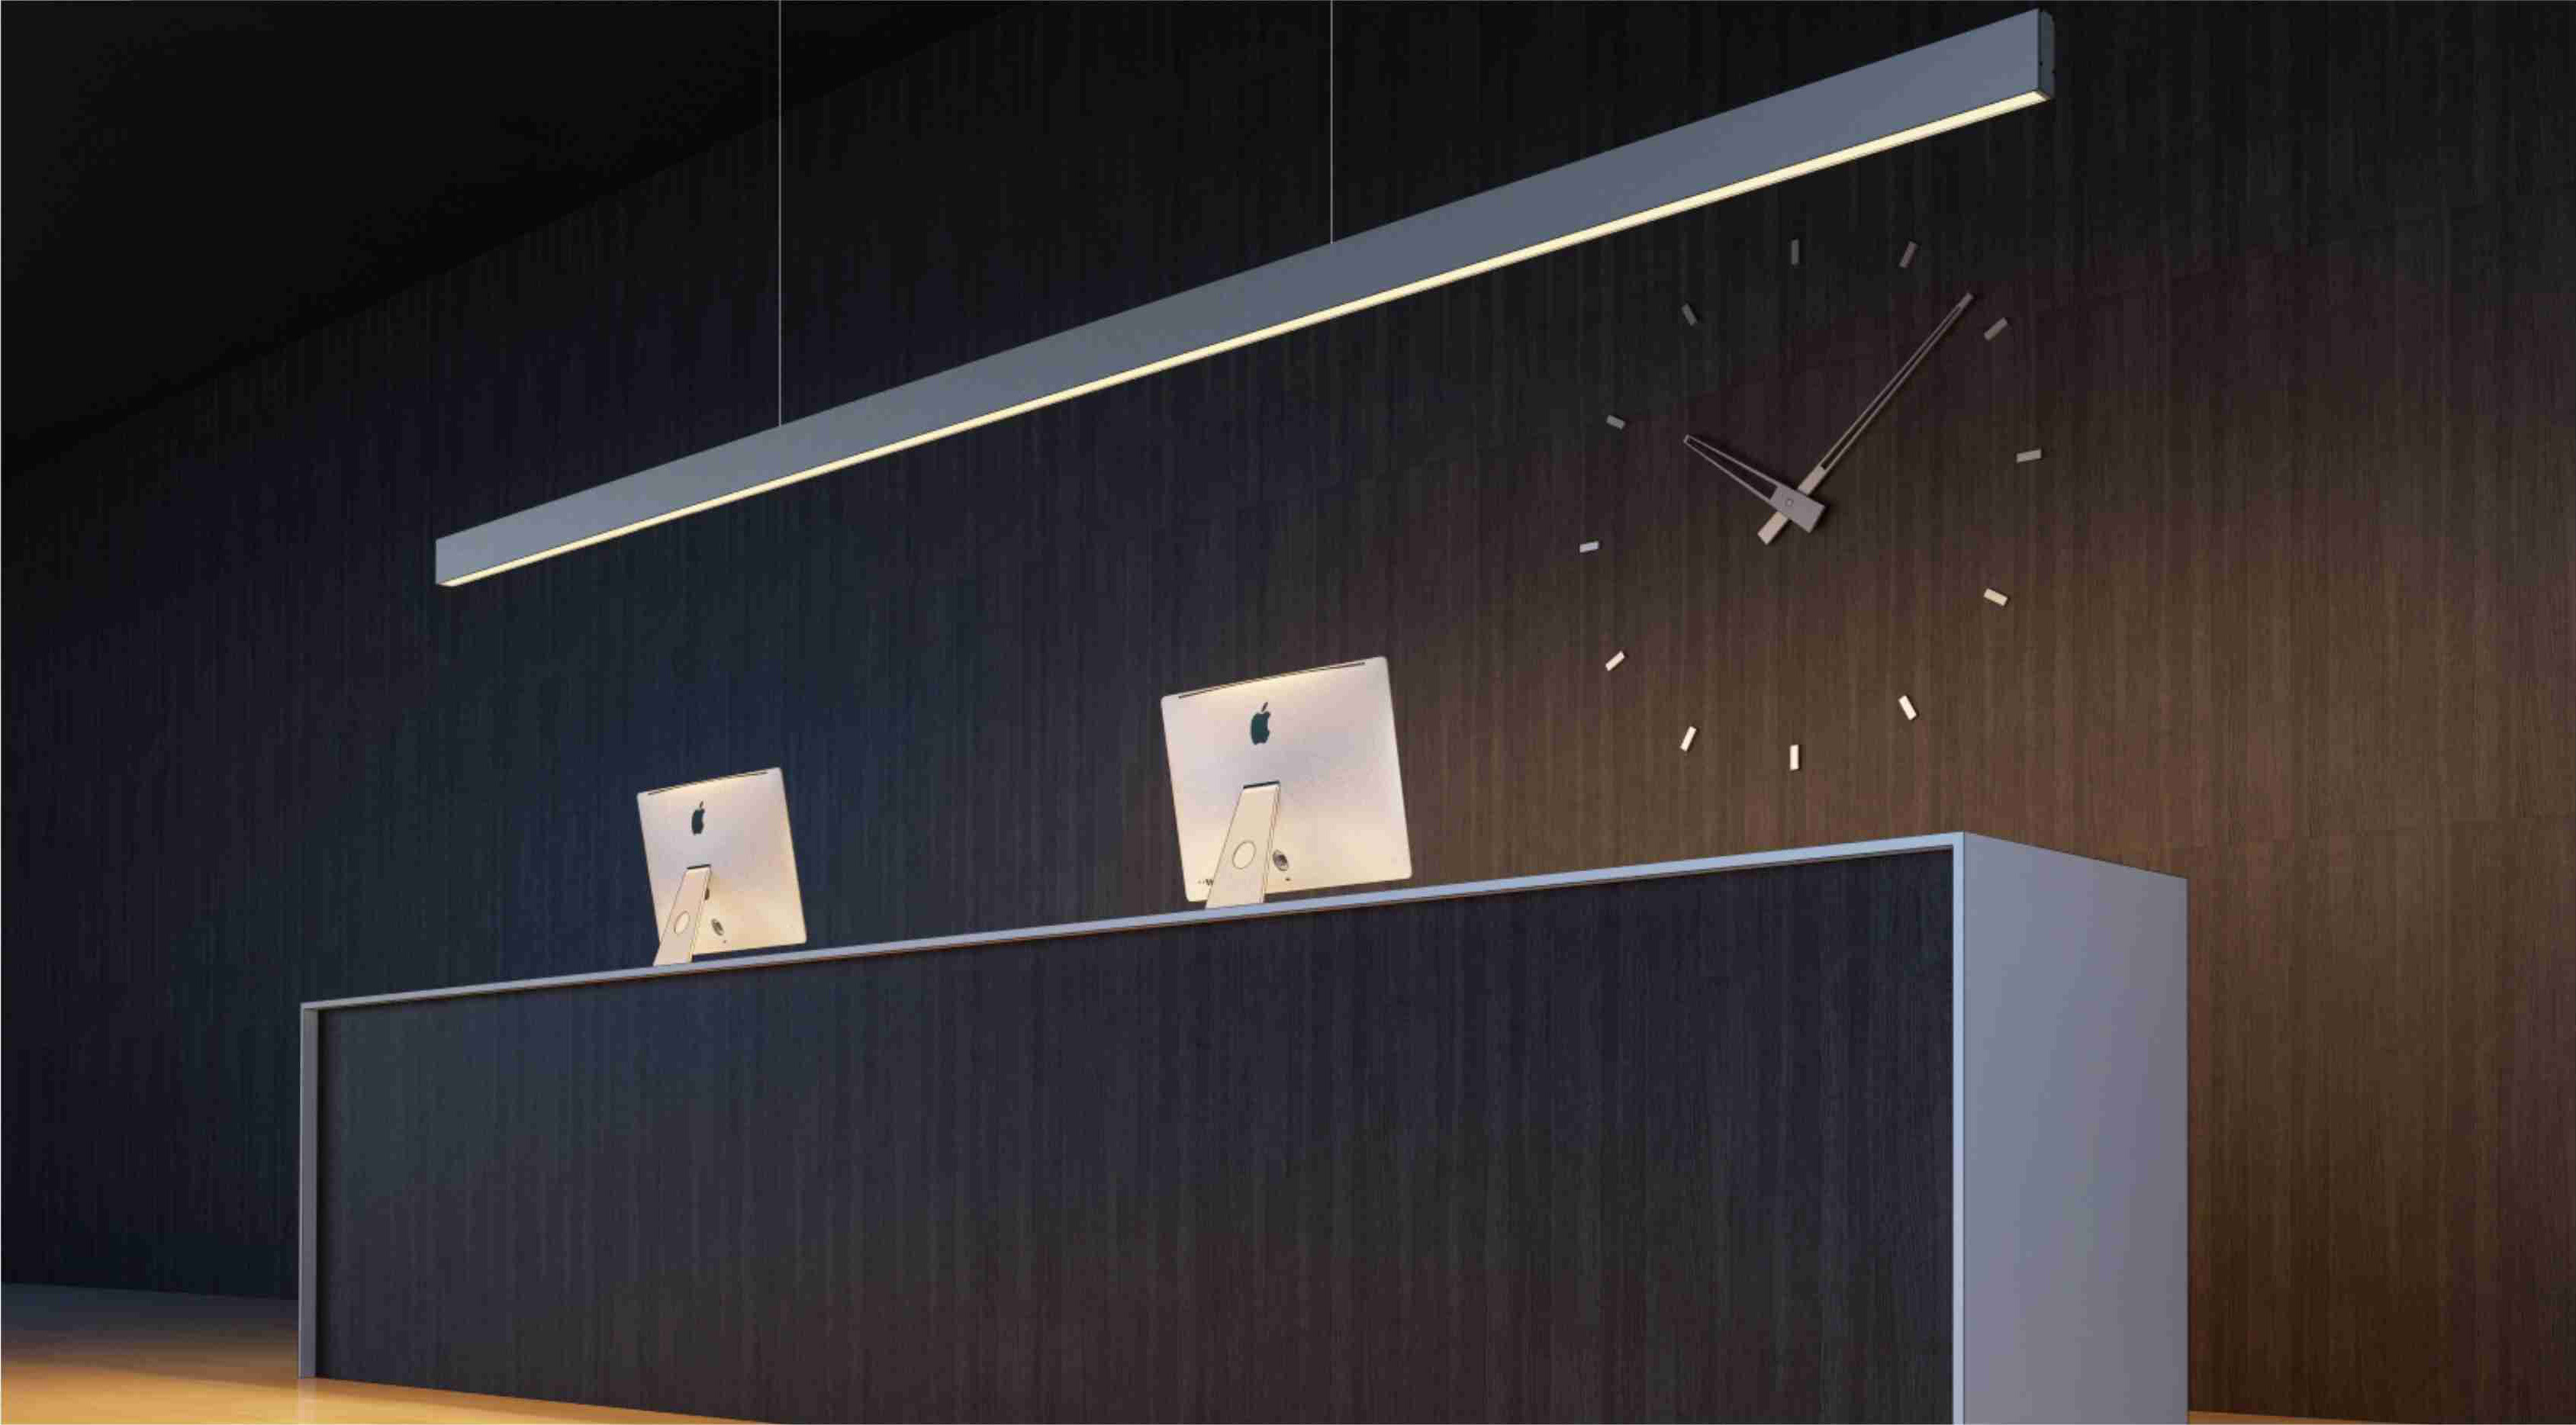 Interesante blog meetthings art culos sobre leds de - Articulos iluminacion ...